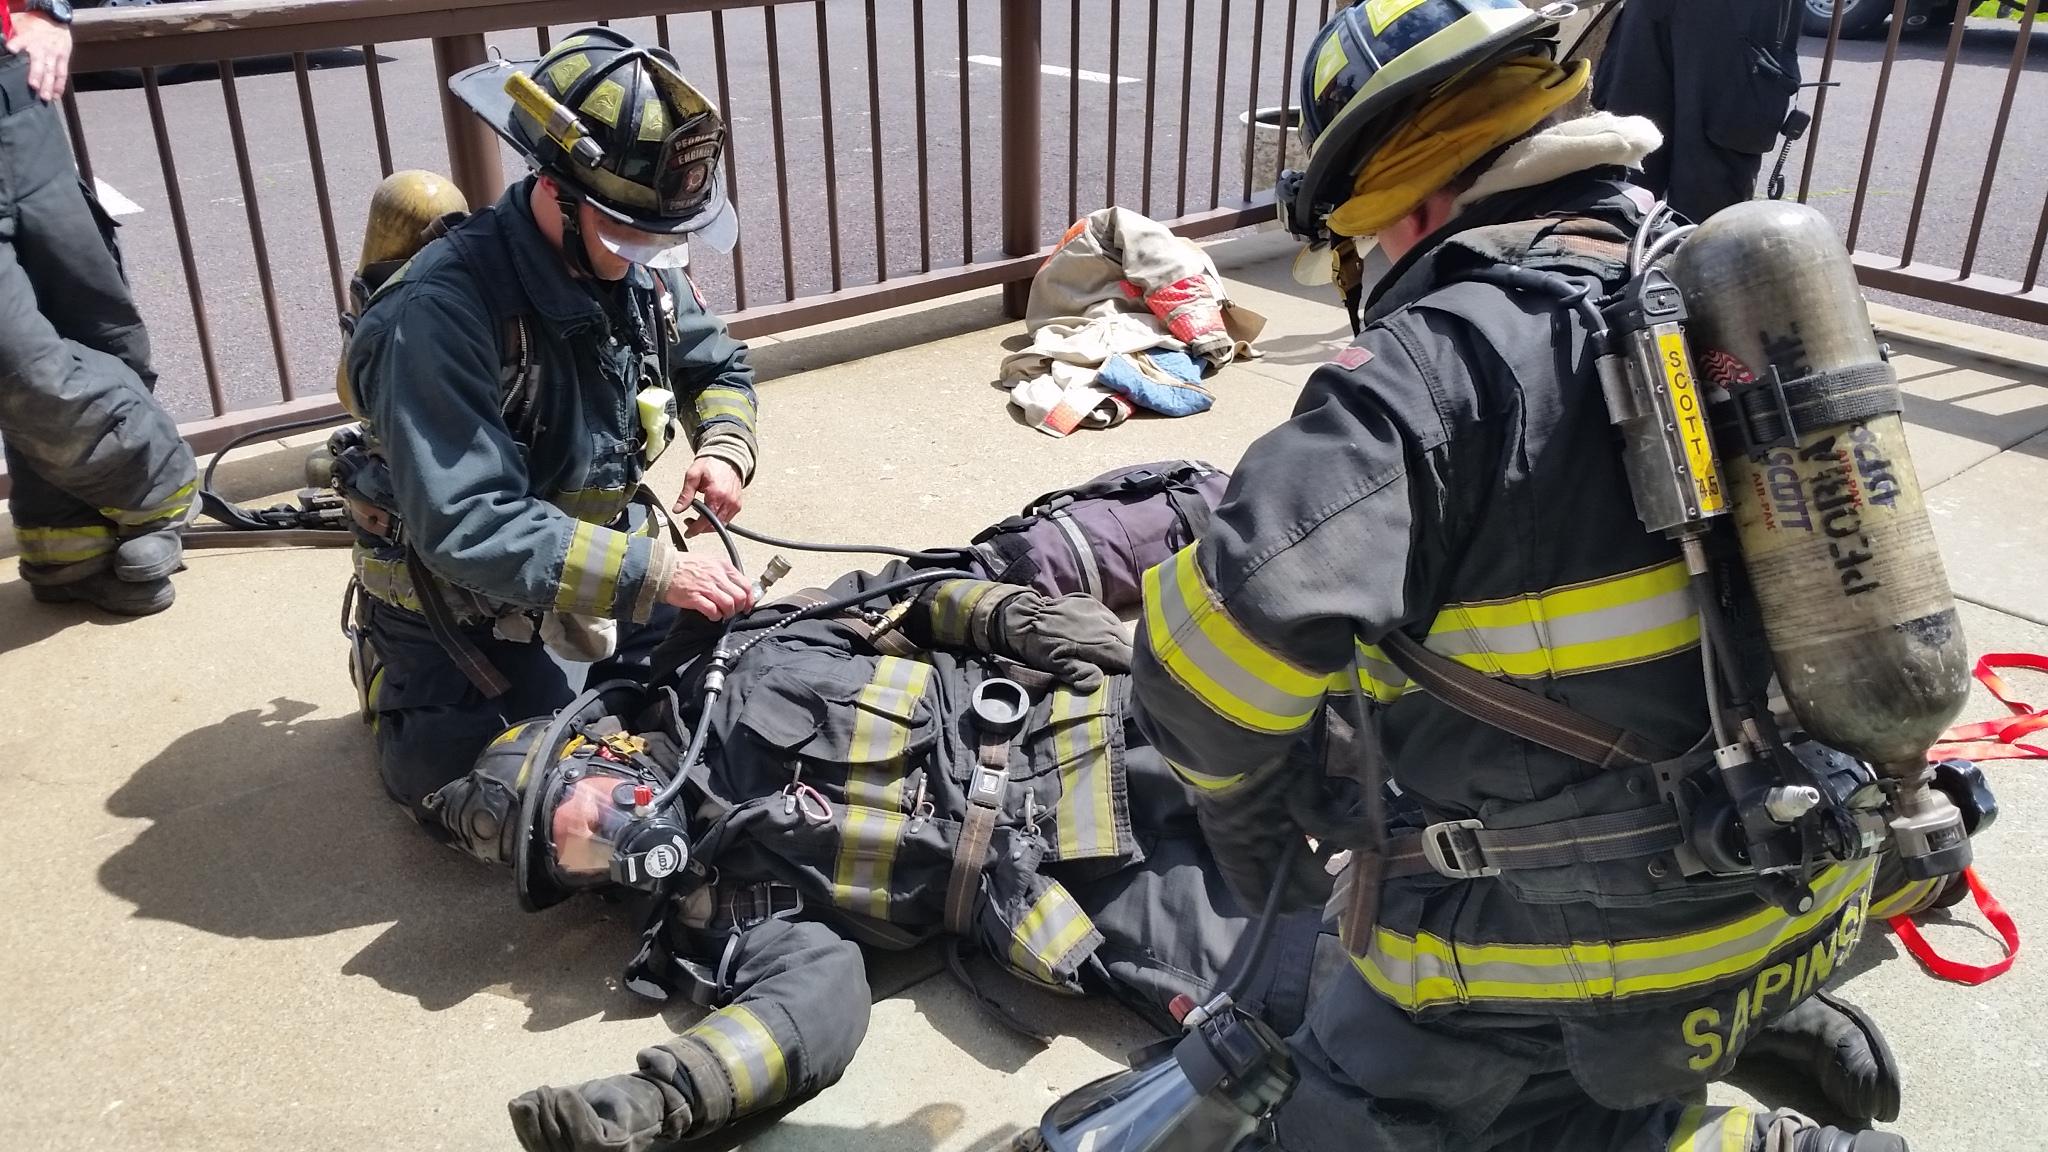 Firefighter Survival